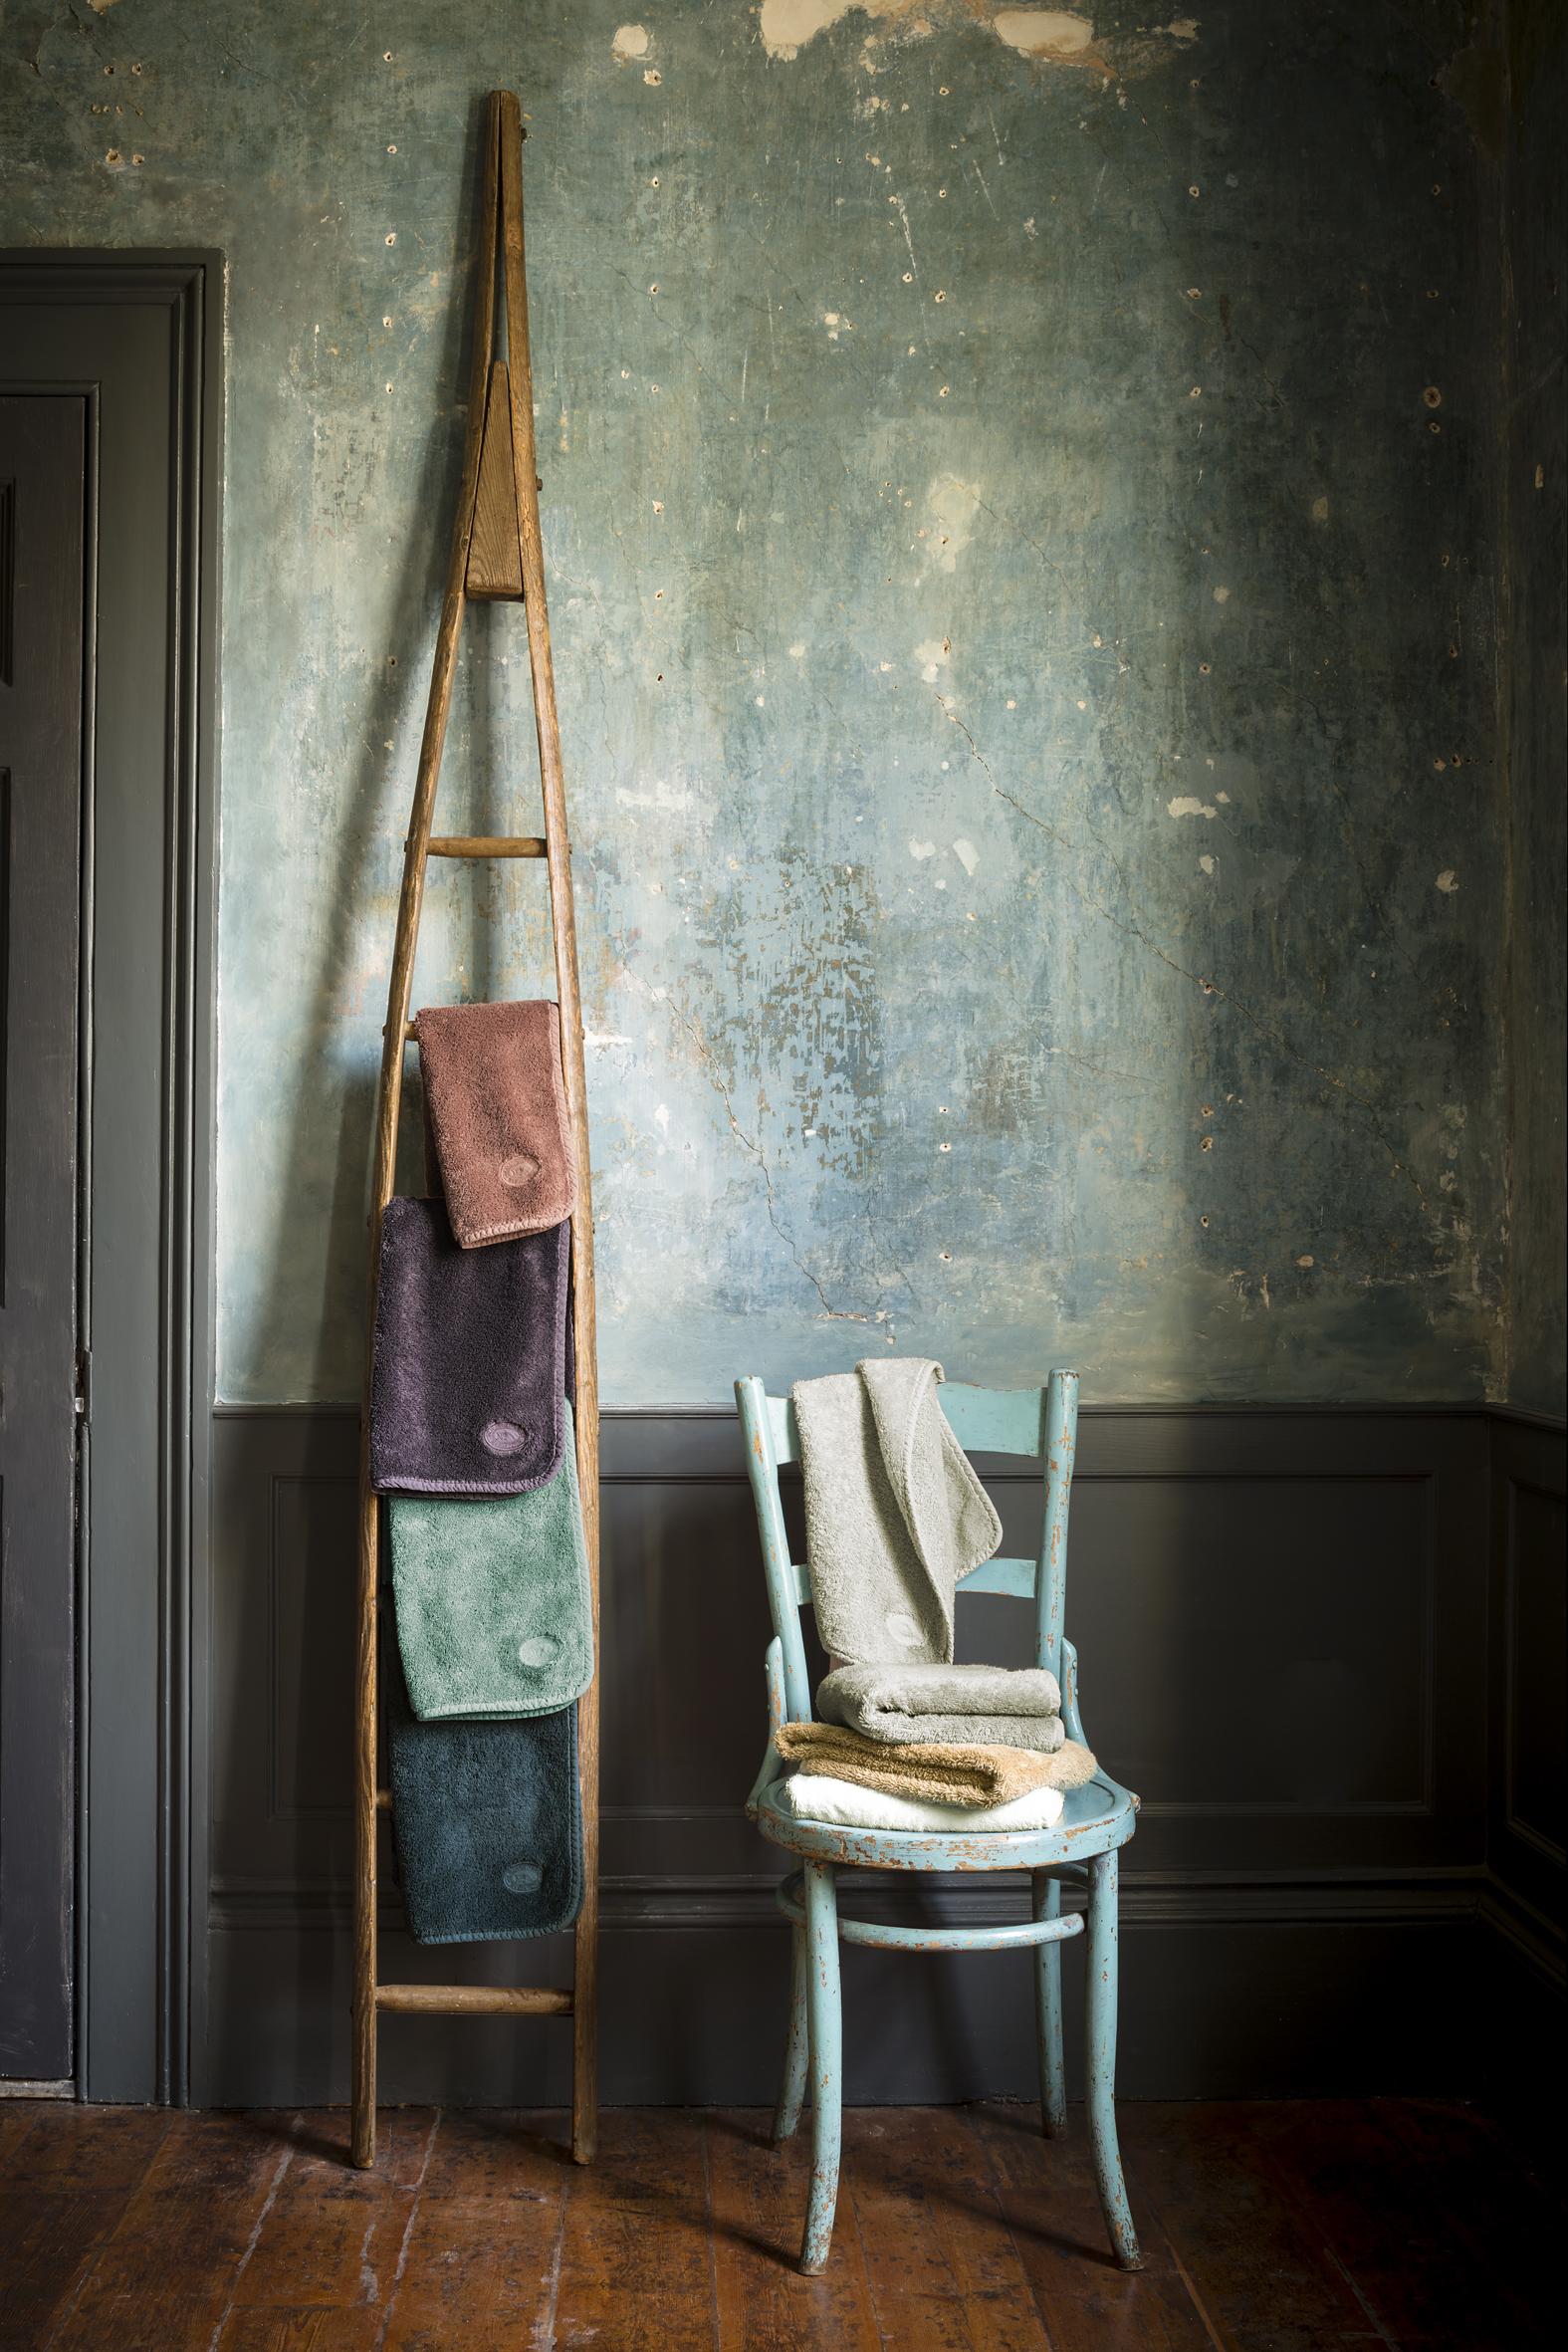 Royal Turkish Towels - Christy